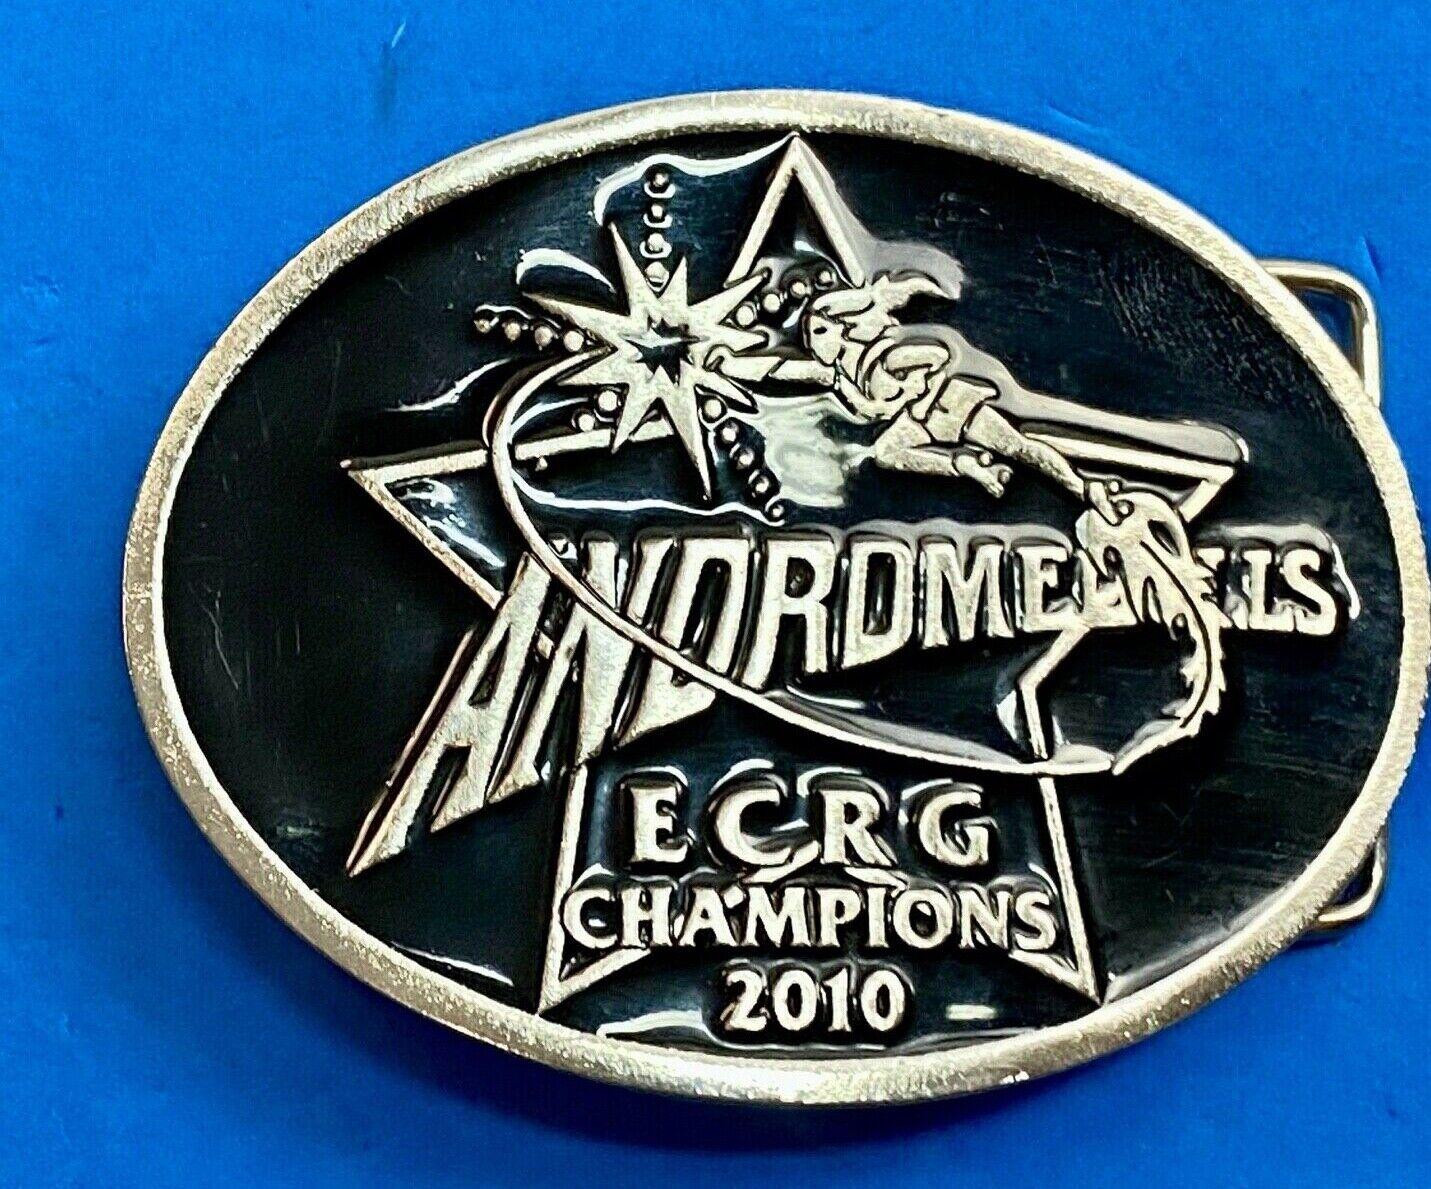 Andrdomedolls Roller Girls Emerald City ECRG Champions 2010 belt buckle